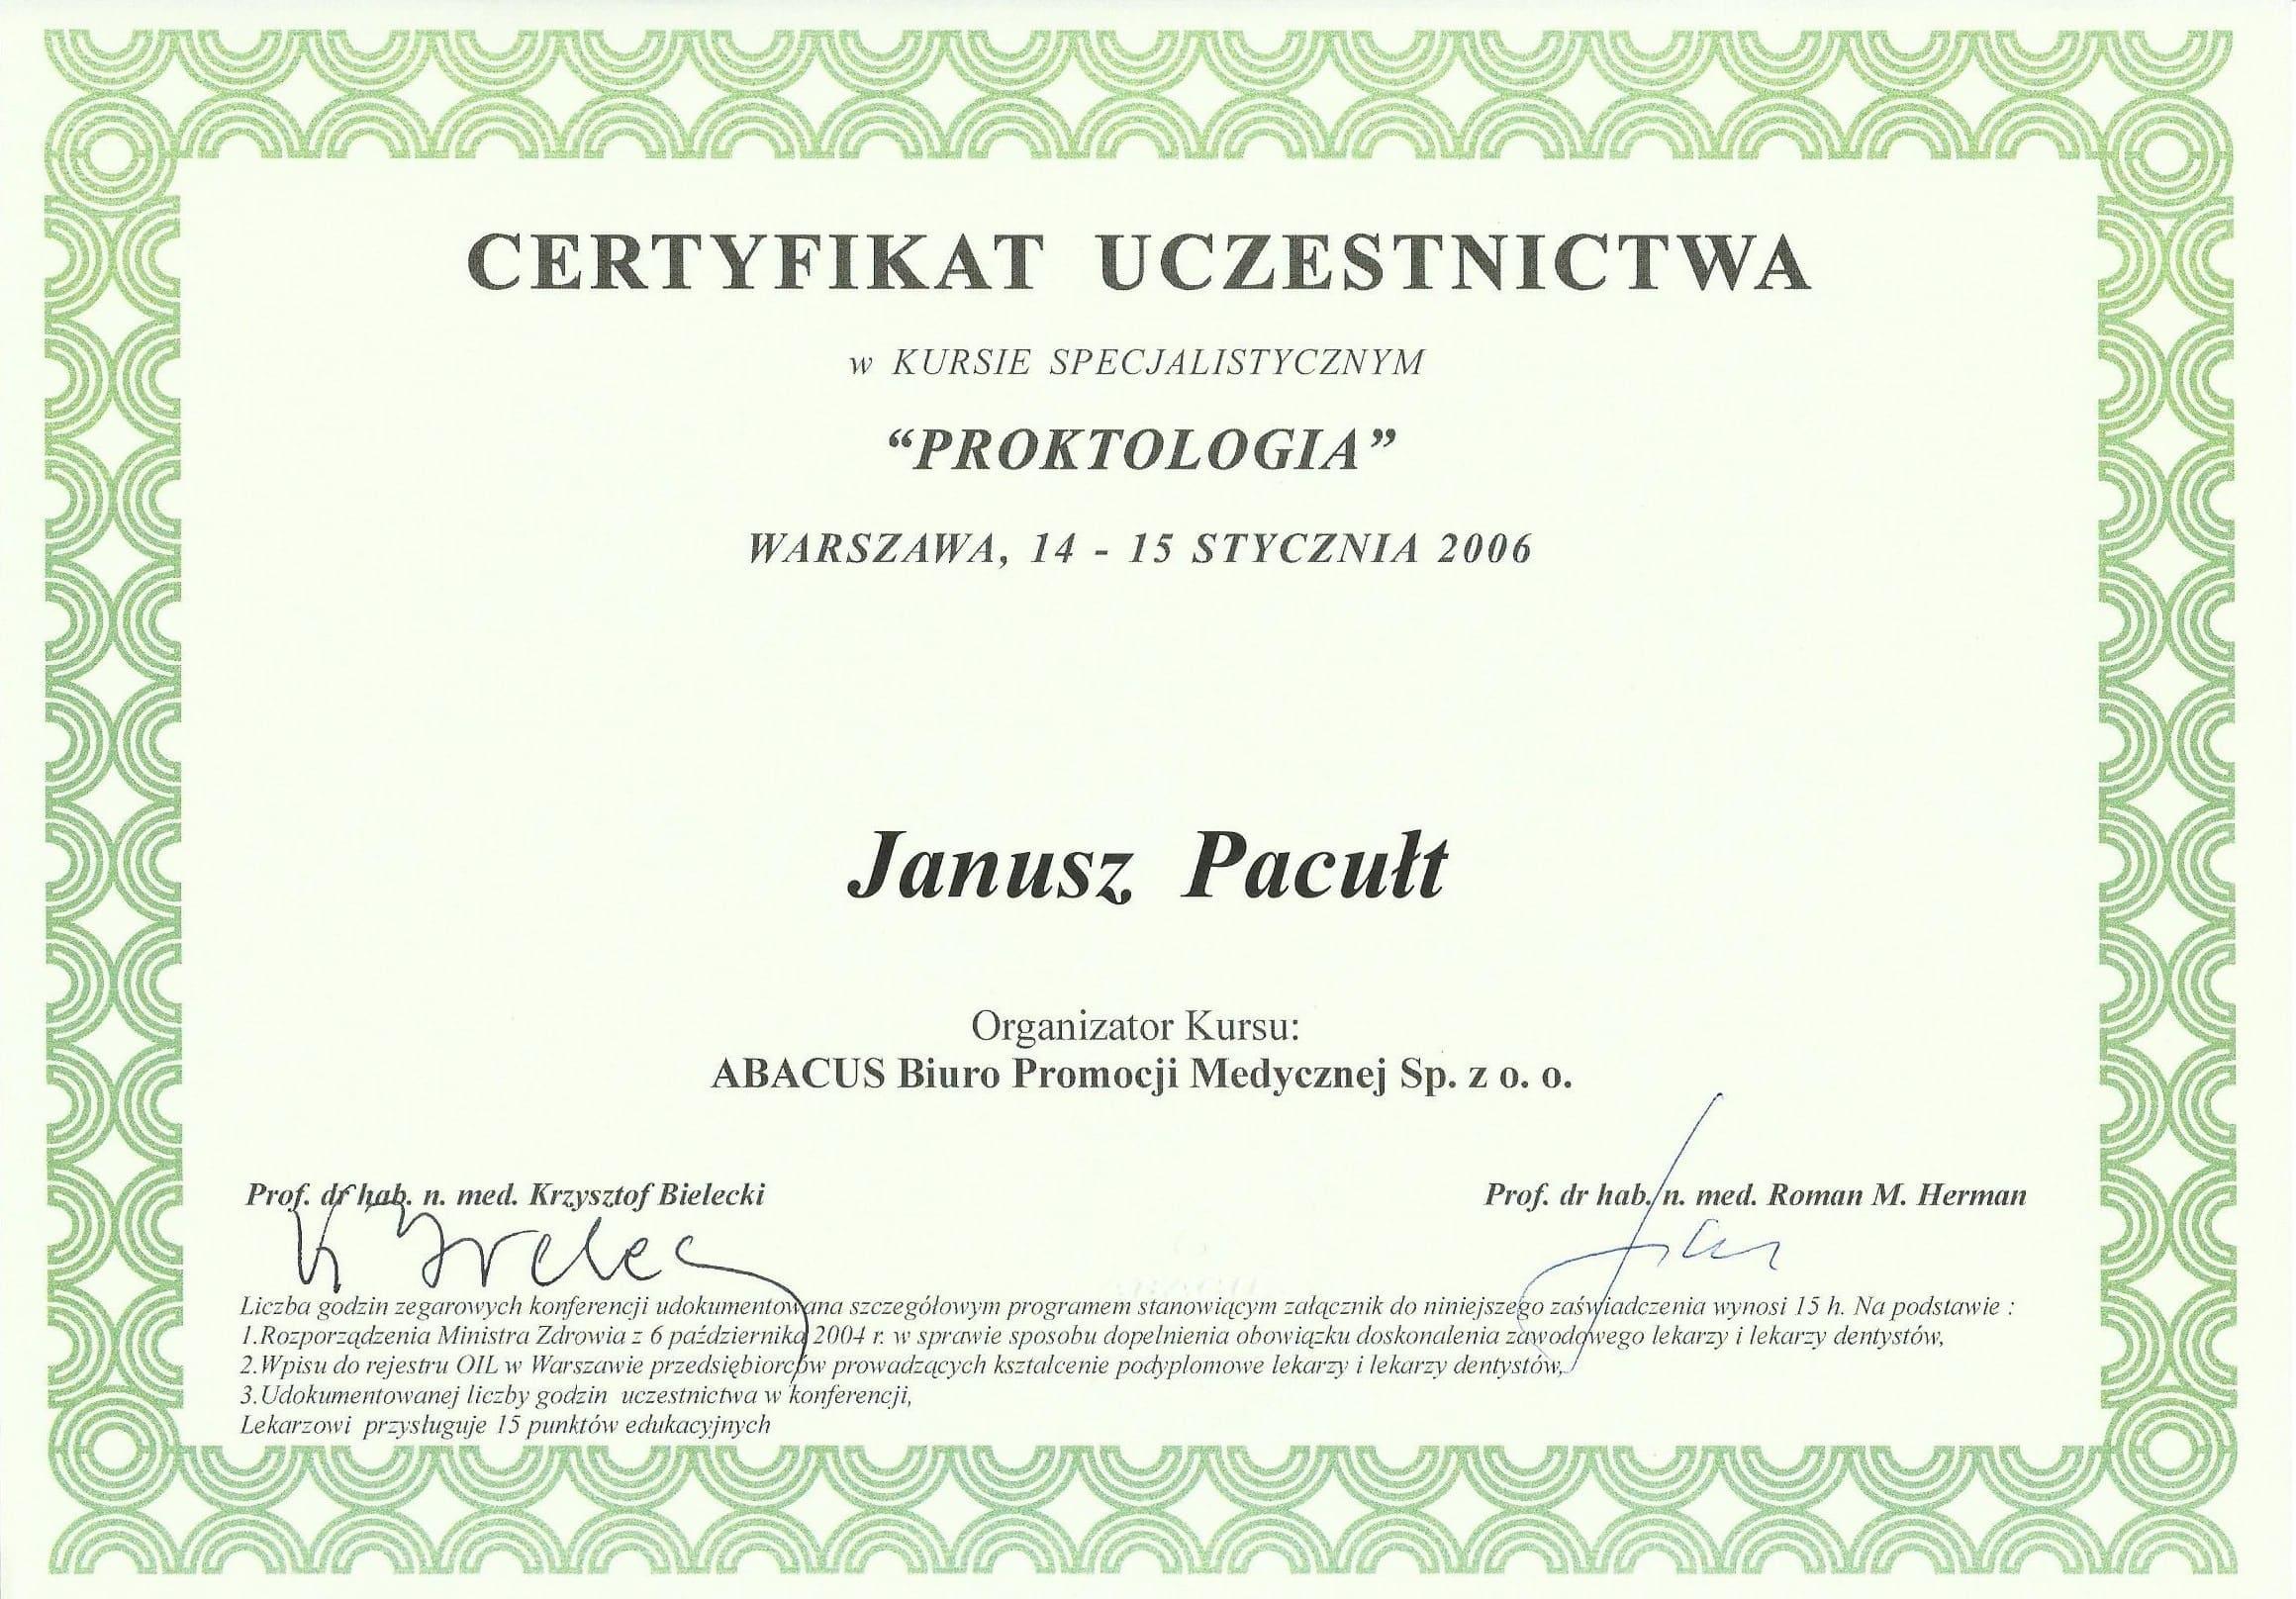 2006 Proktologia W-wa